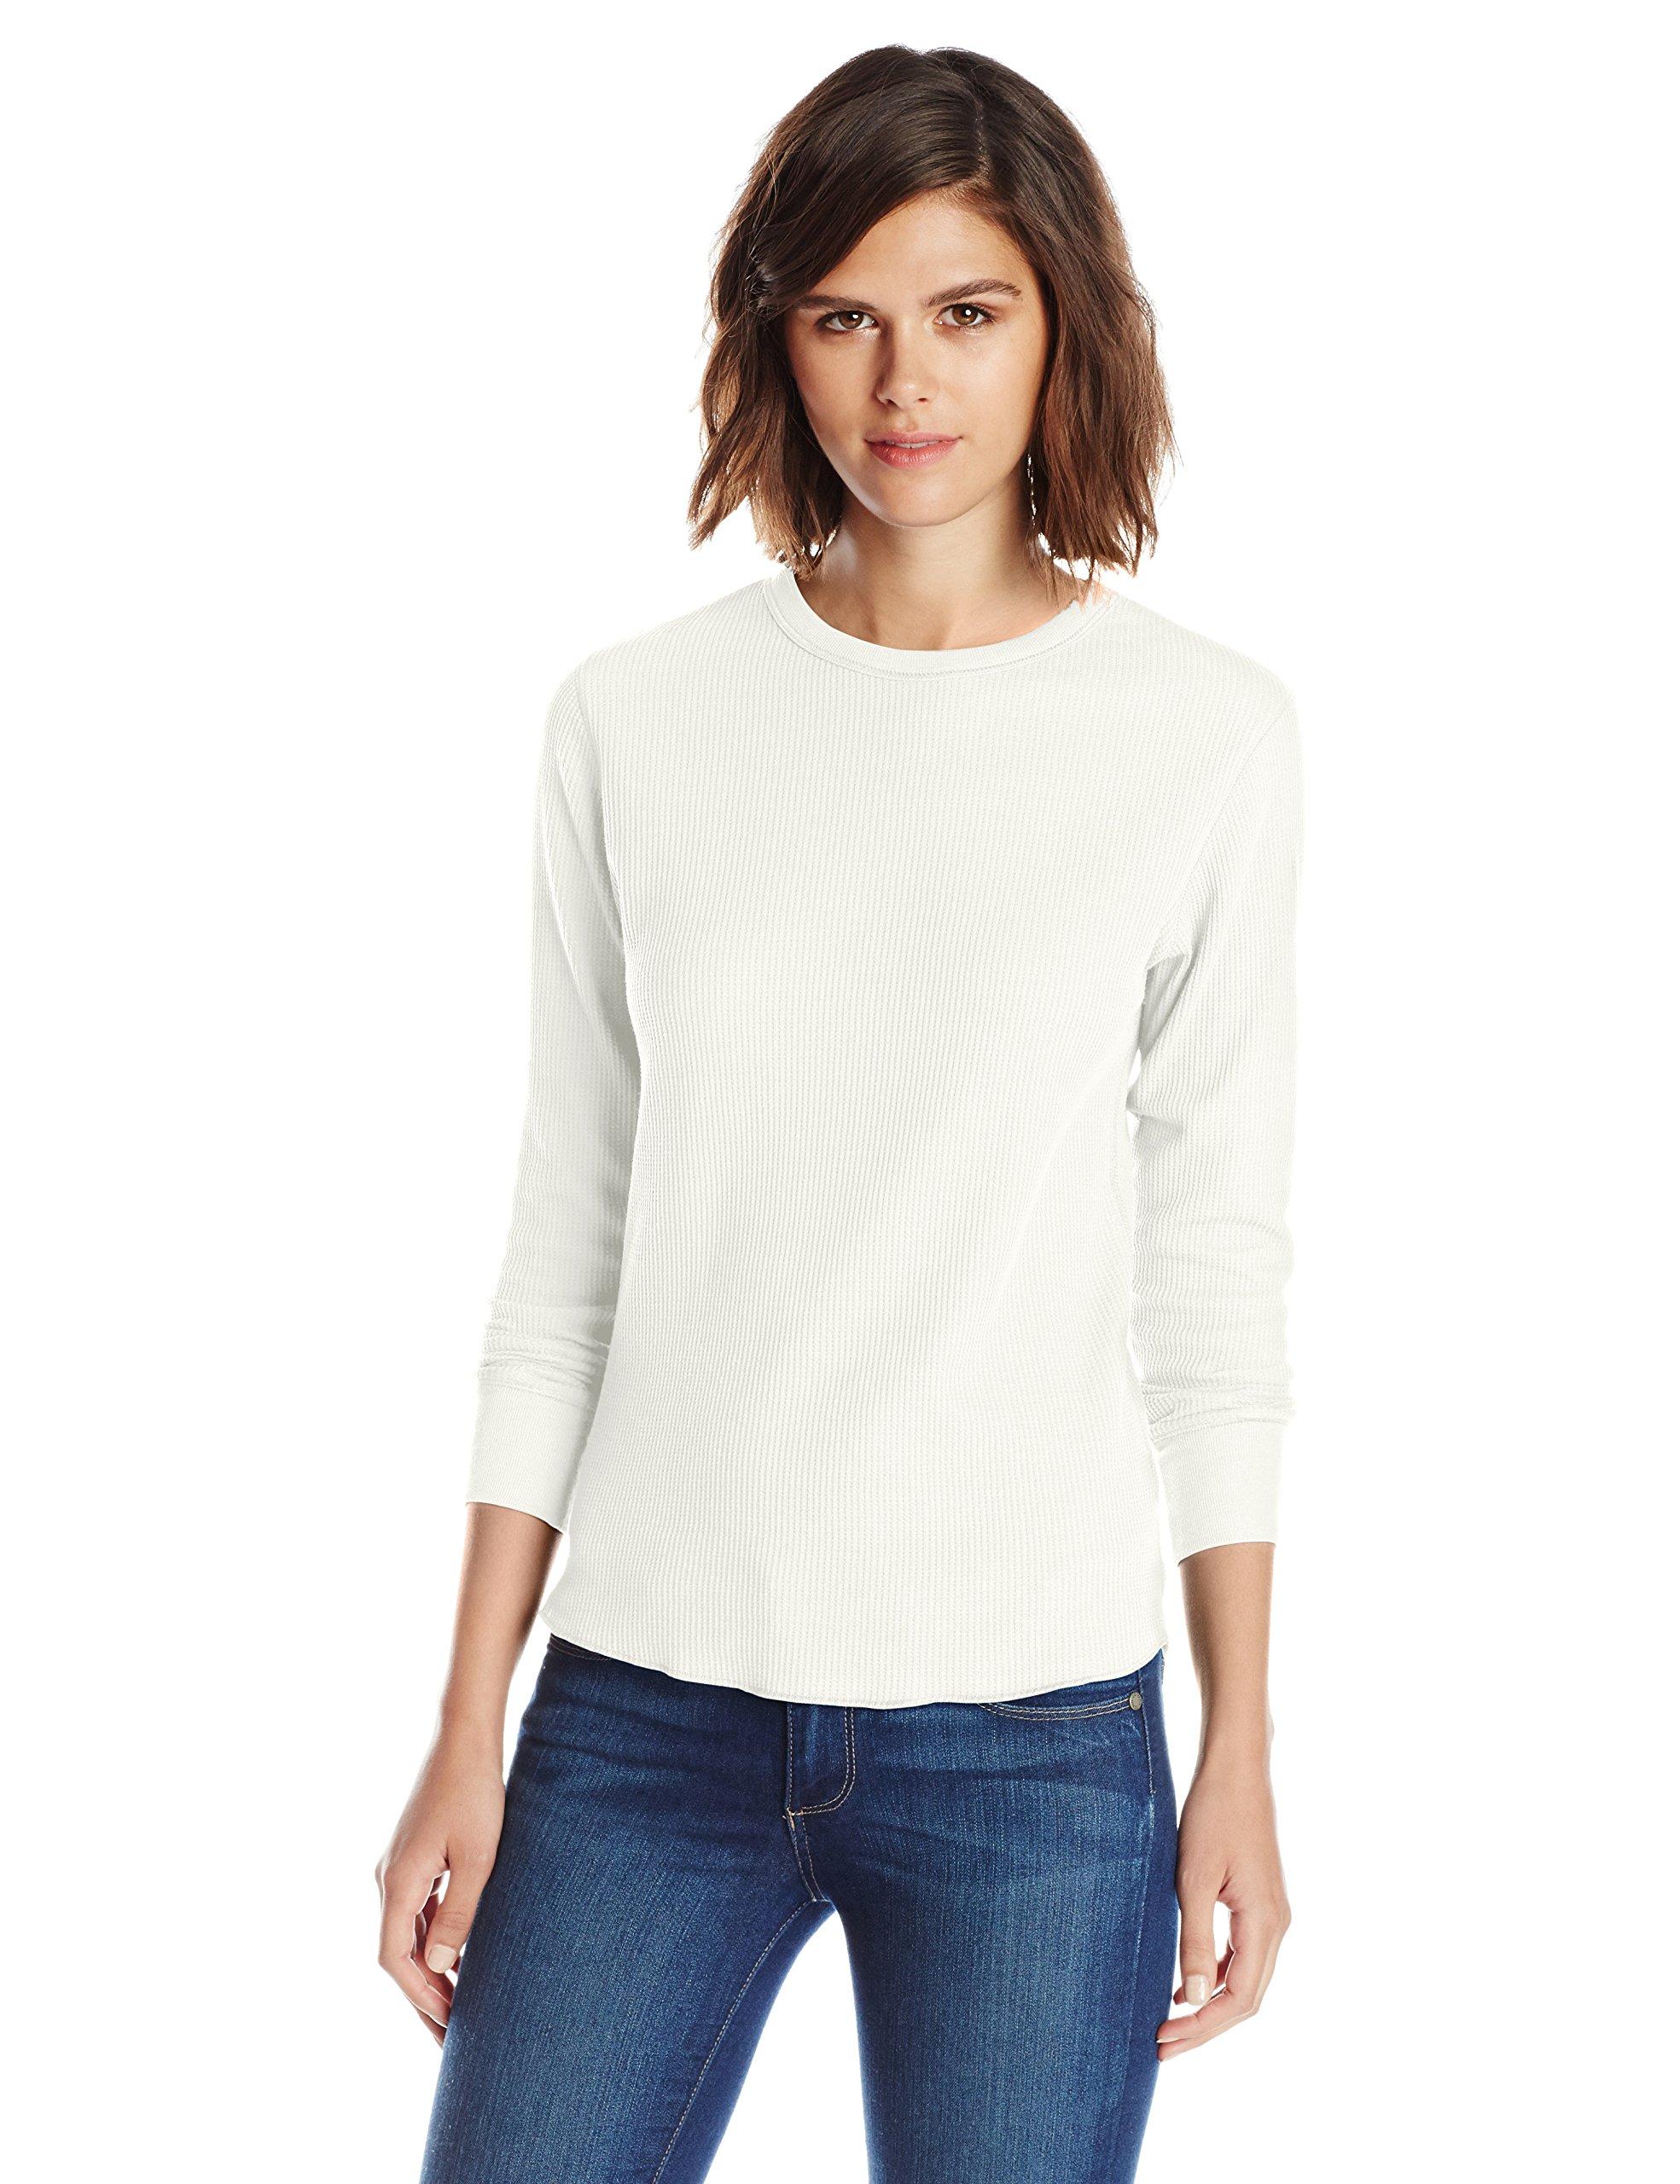 Hanes Women's Plus-Size X-Temp Thermal Crew Shirt, Snow White, Large